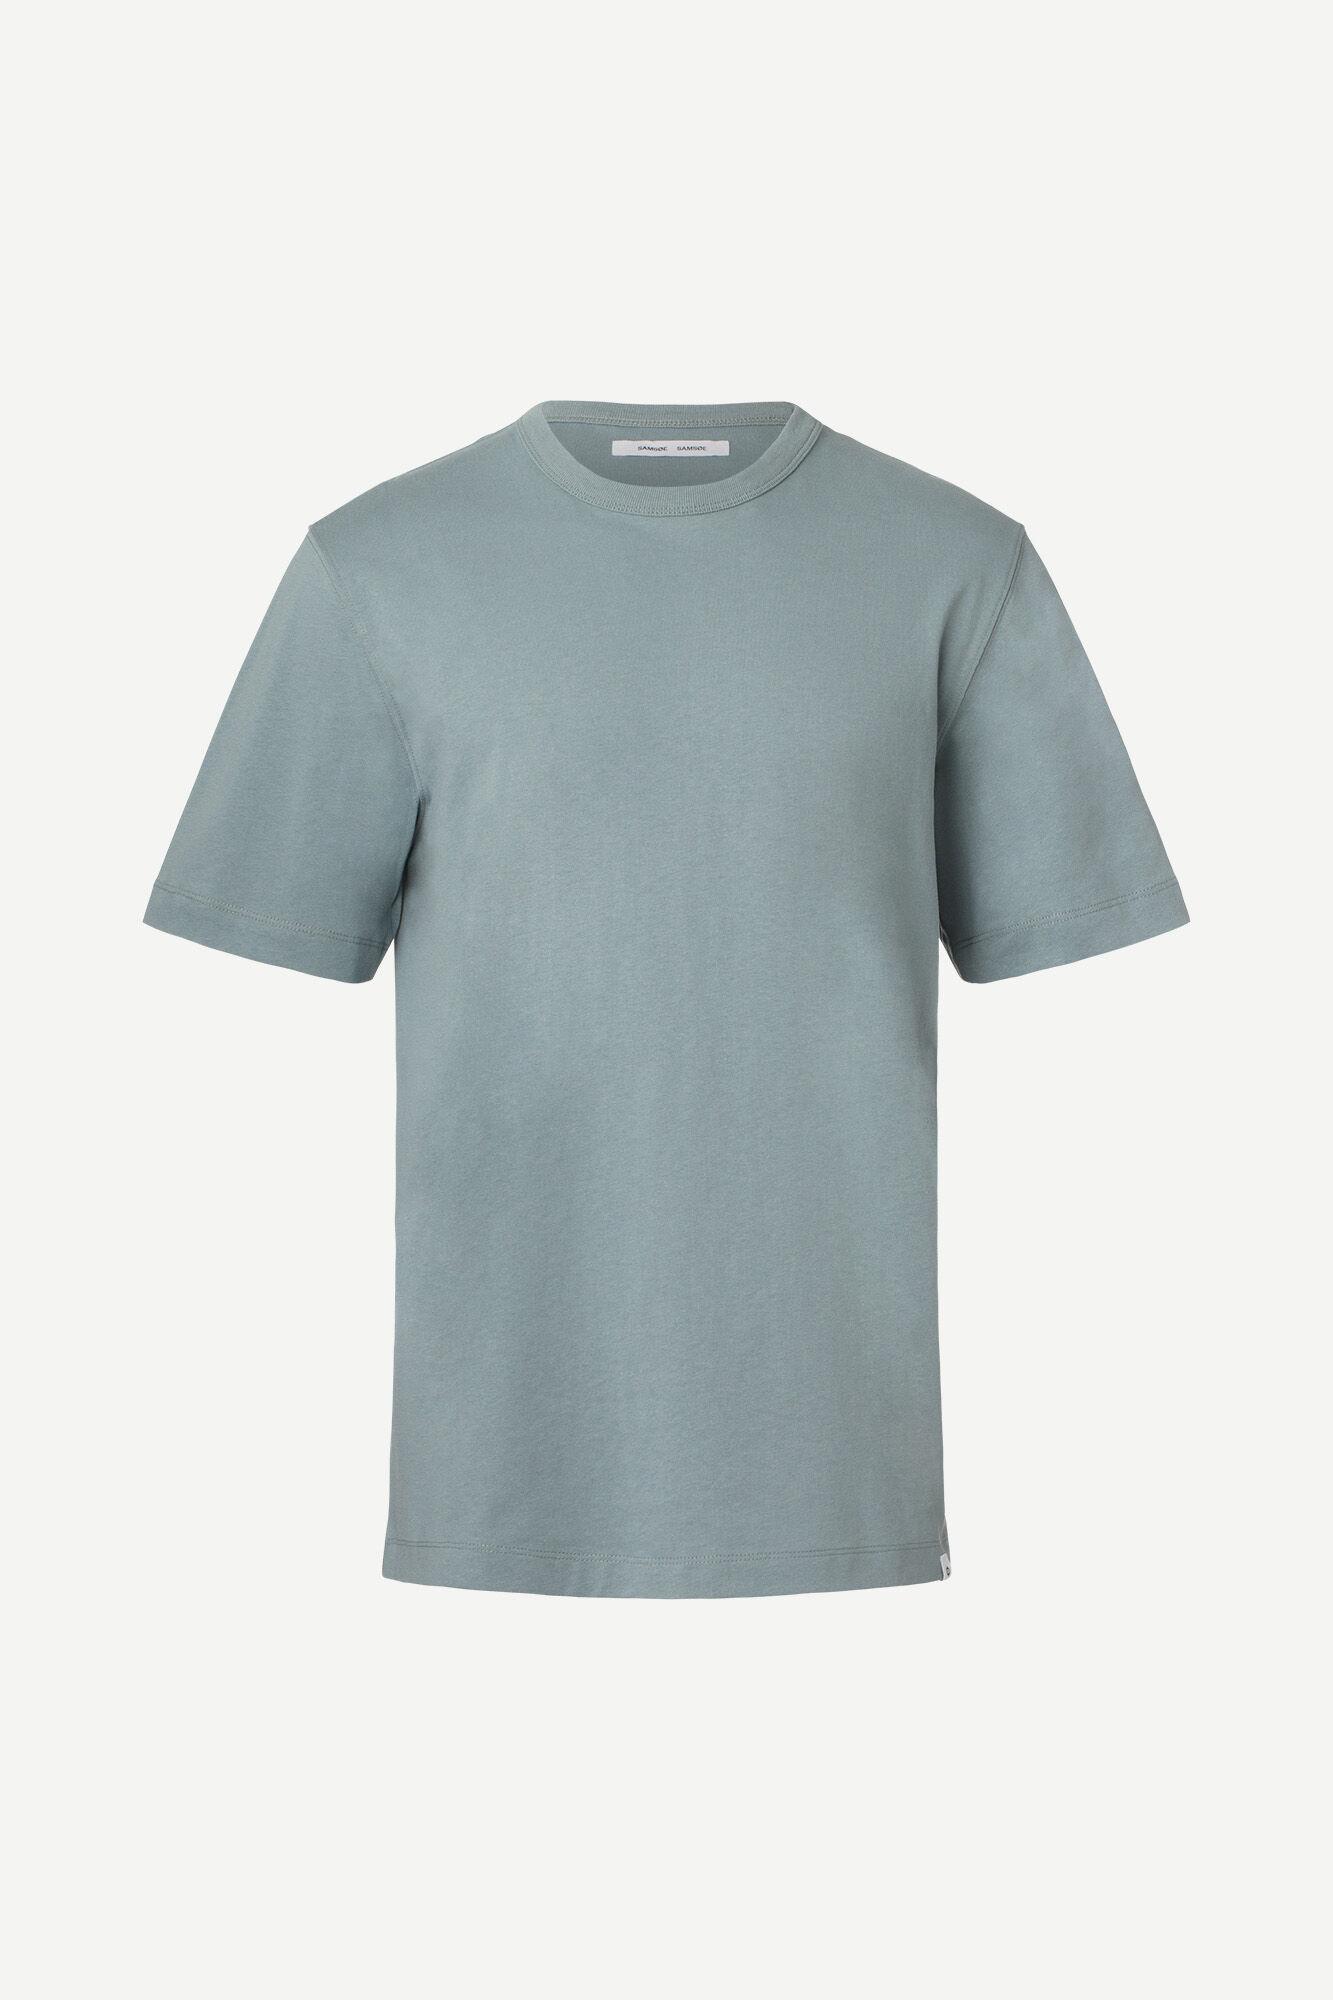 Hugo t-shirt 11415, TROOPER